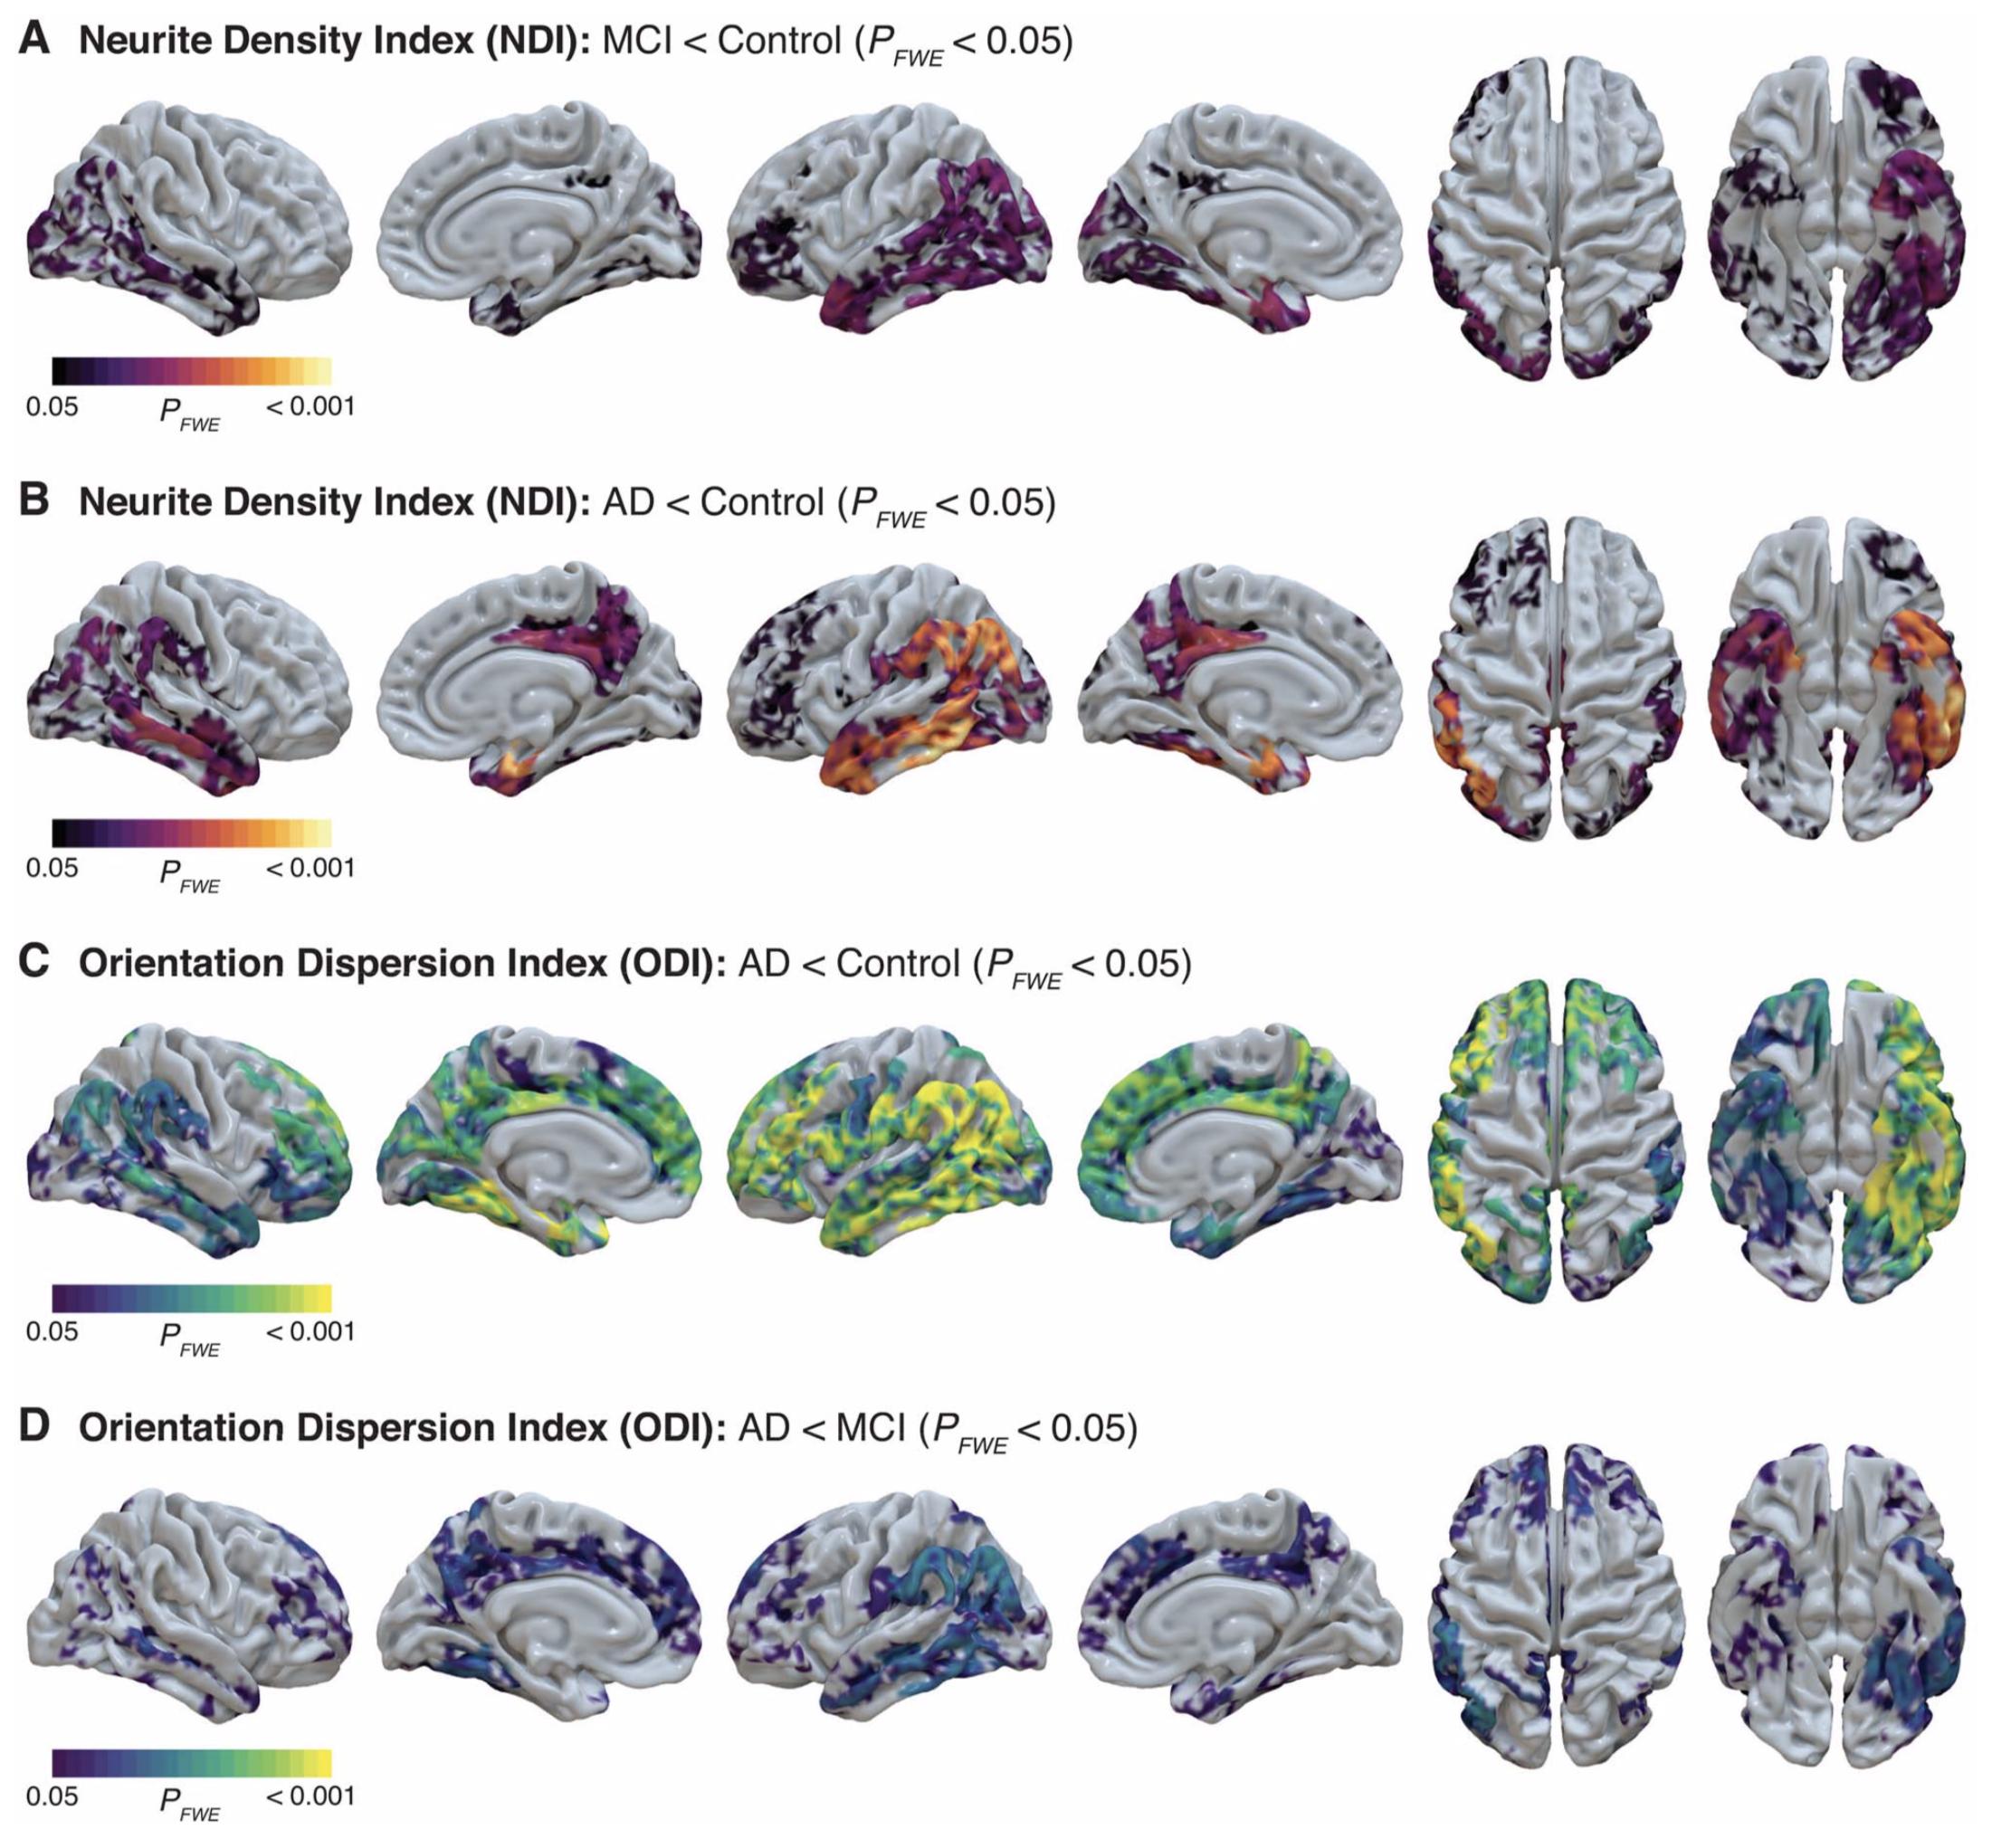 Vogt et al, 2020, Cerebral Cortex